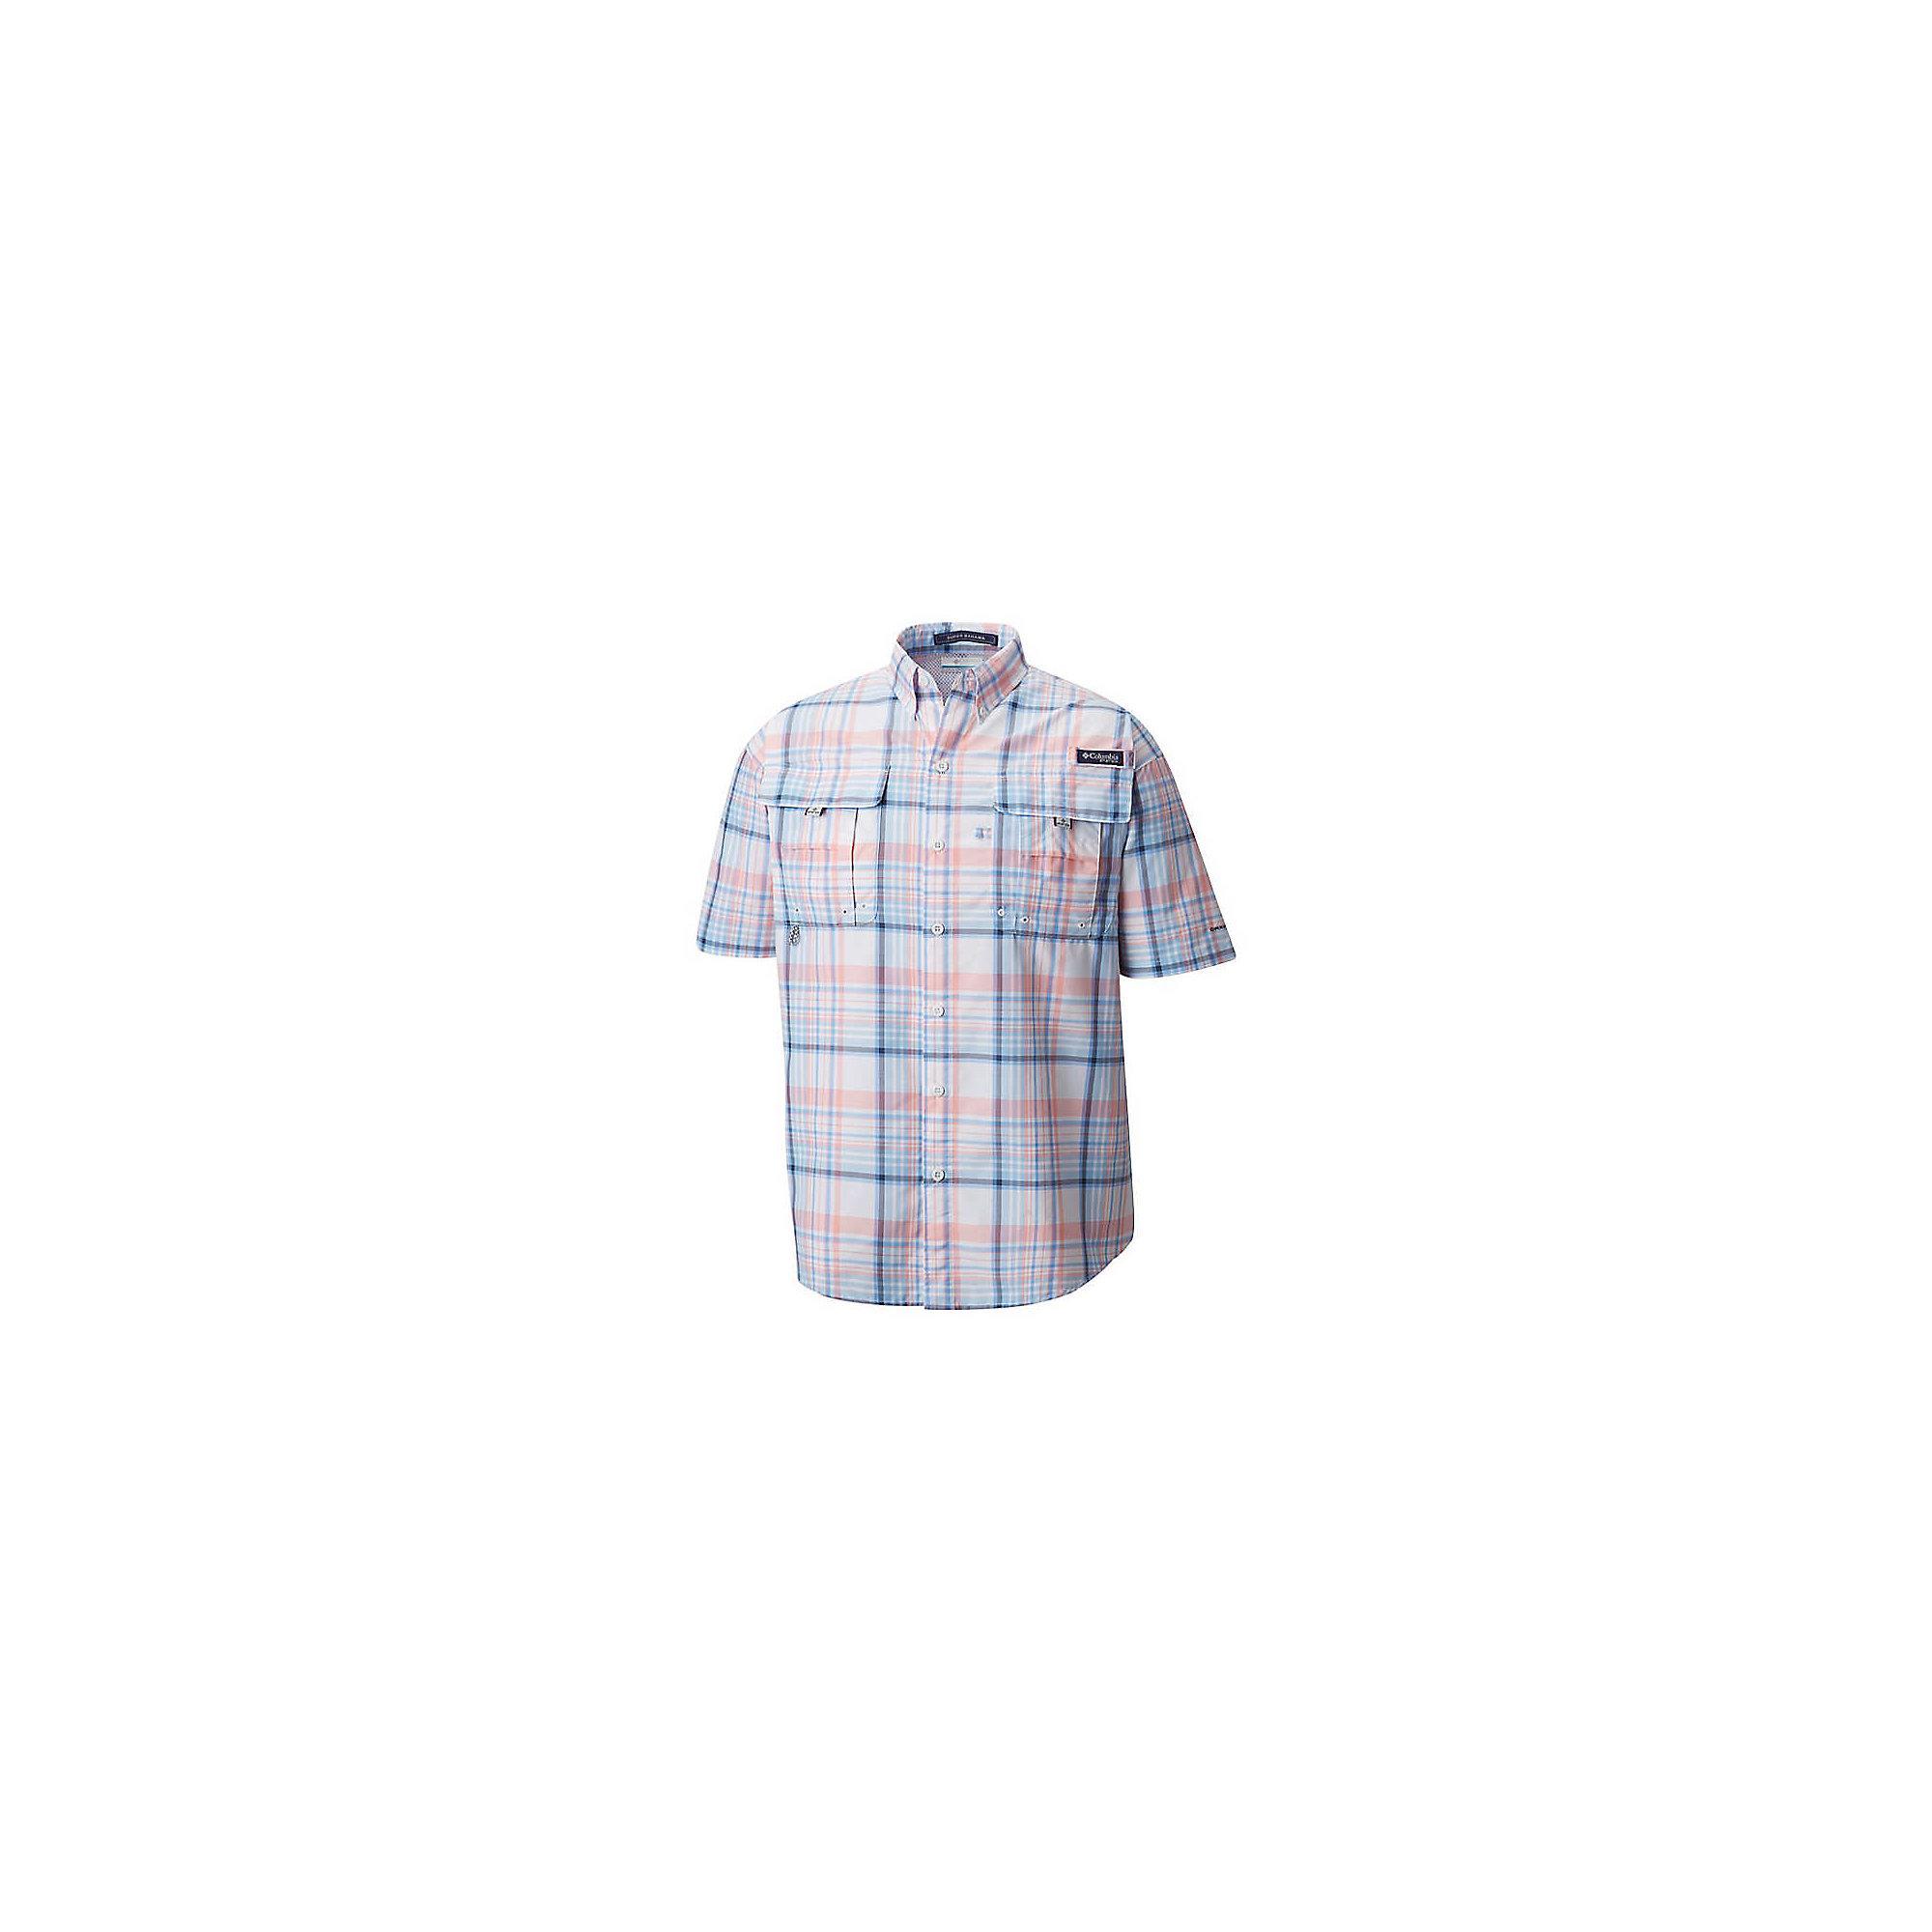 5c1f837959e Columbia - Blue Super Bahama Ss Shirt for Men - Lyst. View fullscreen